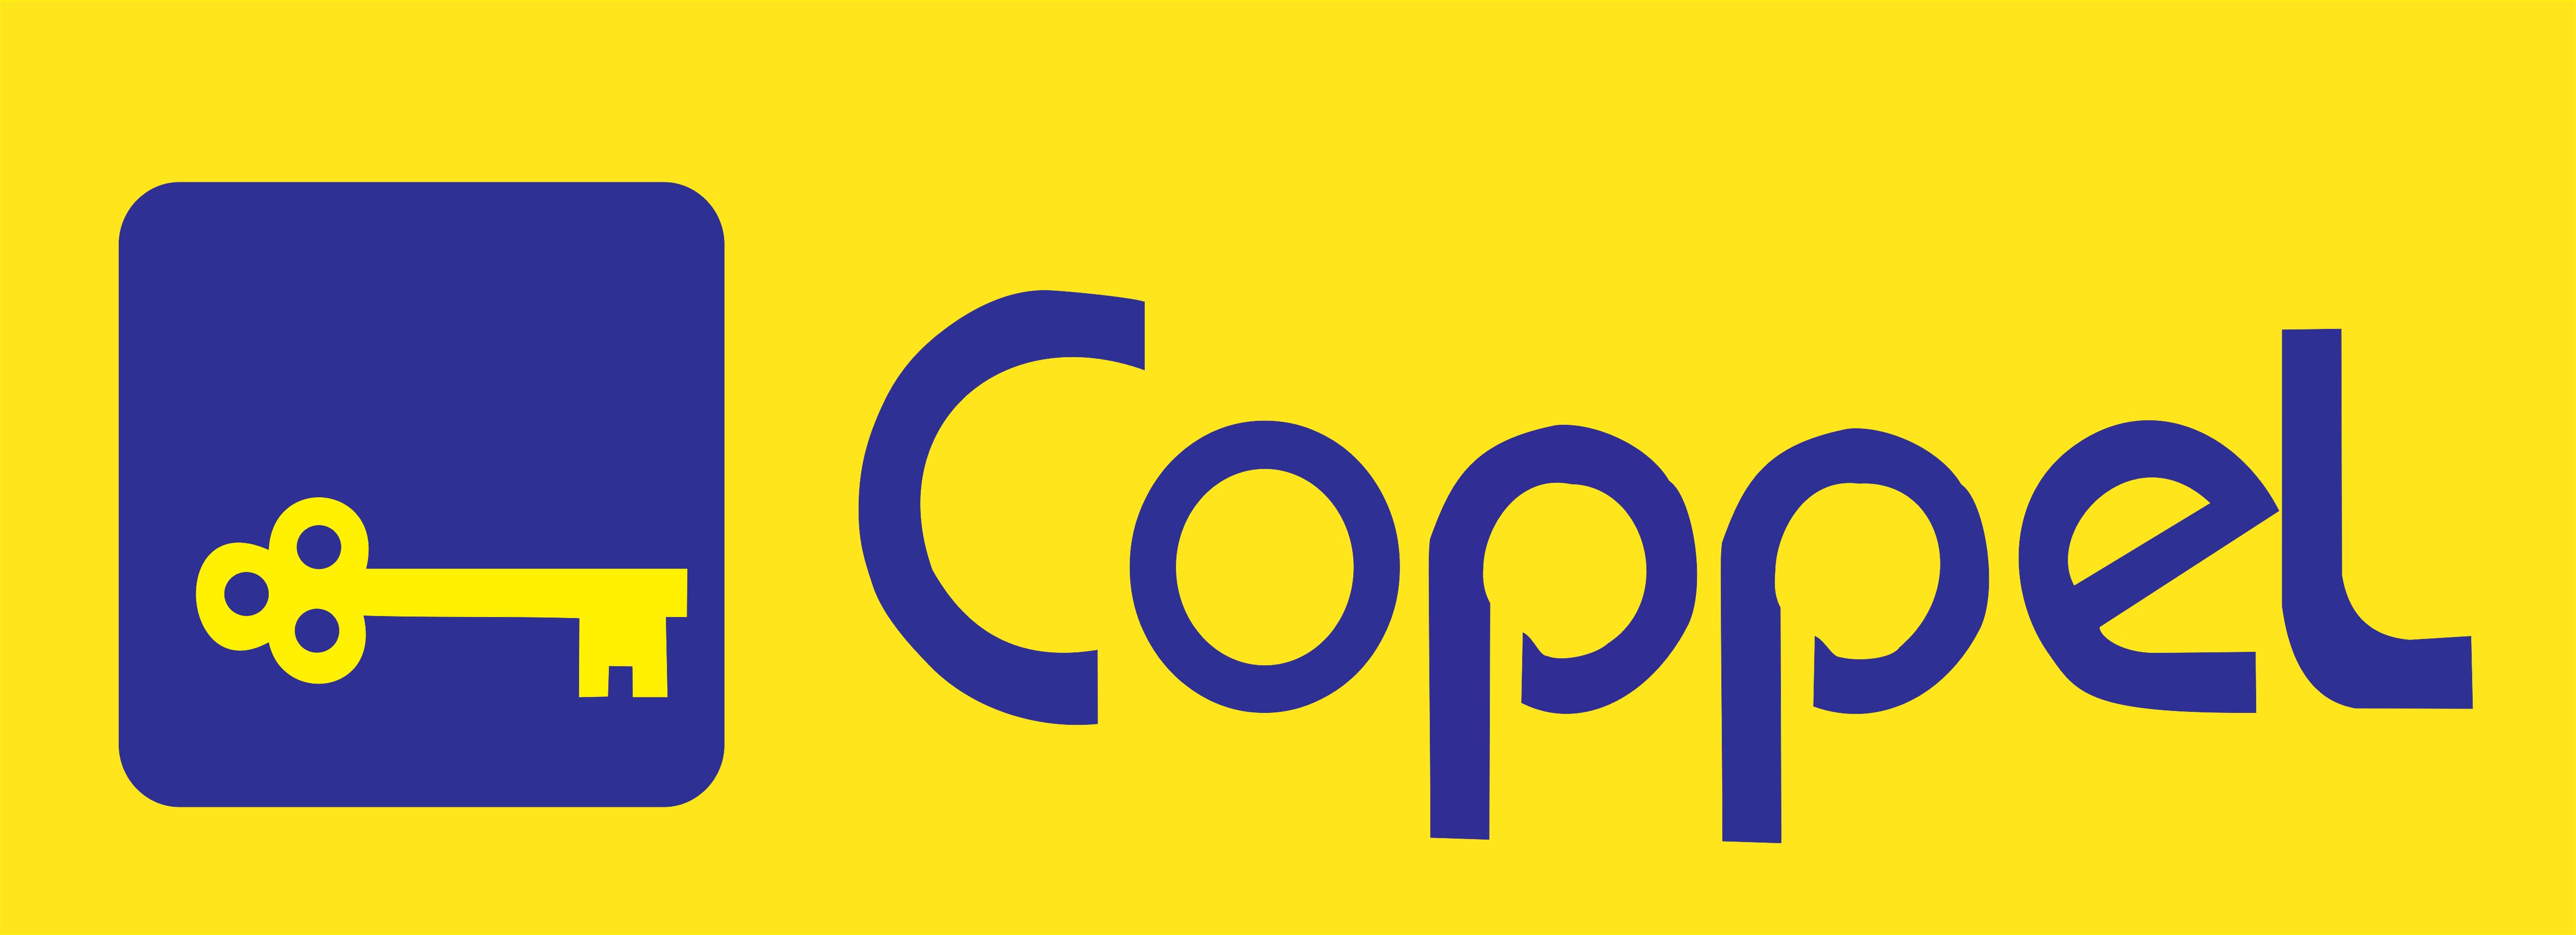 coppel com ganadores del 2016 coppel com ganadores del